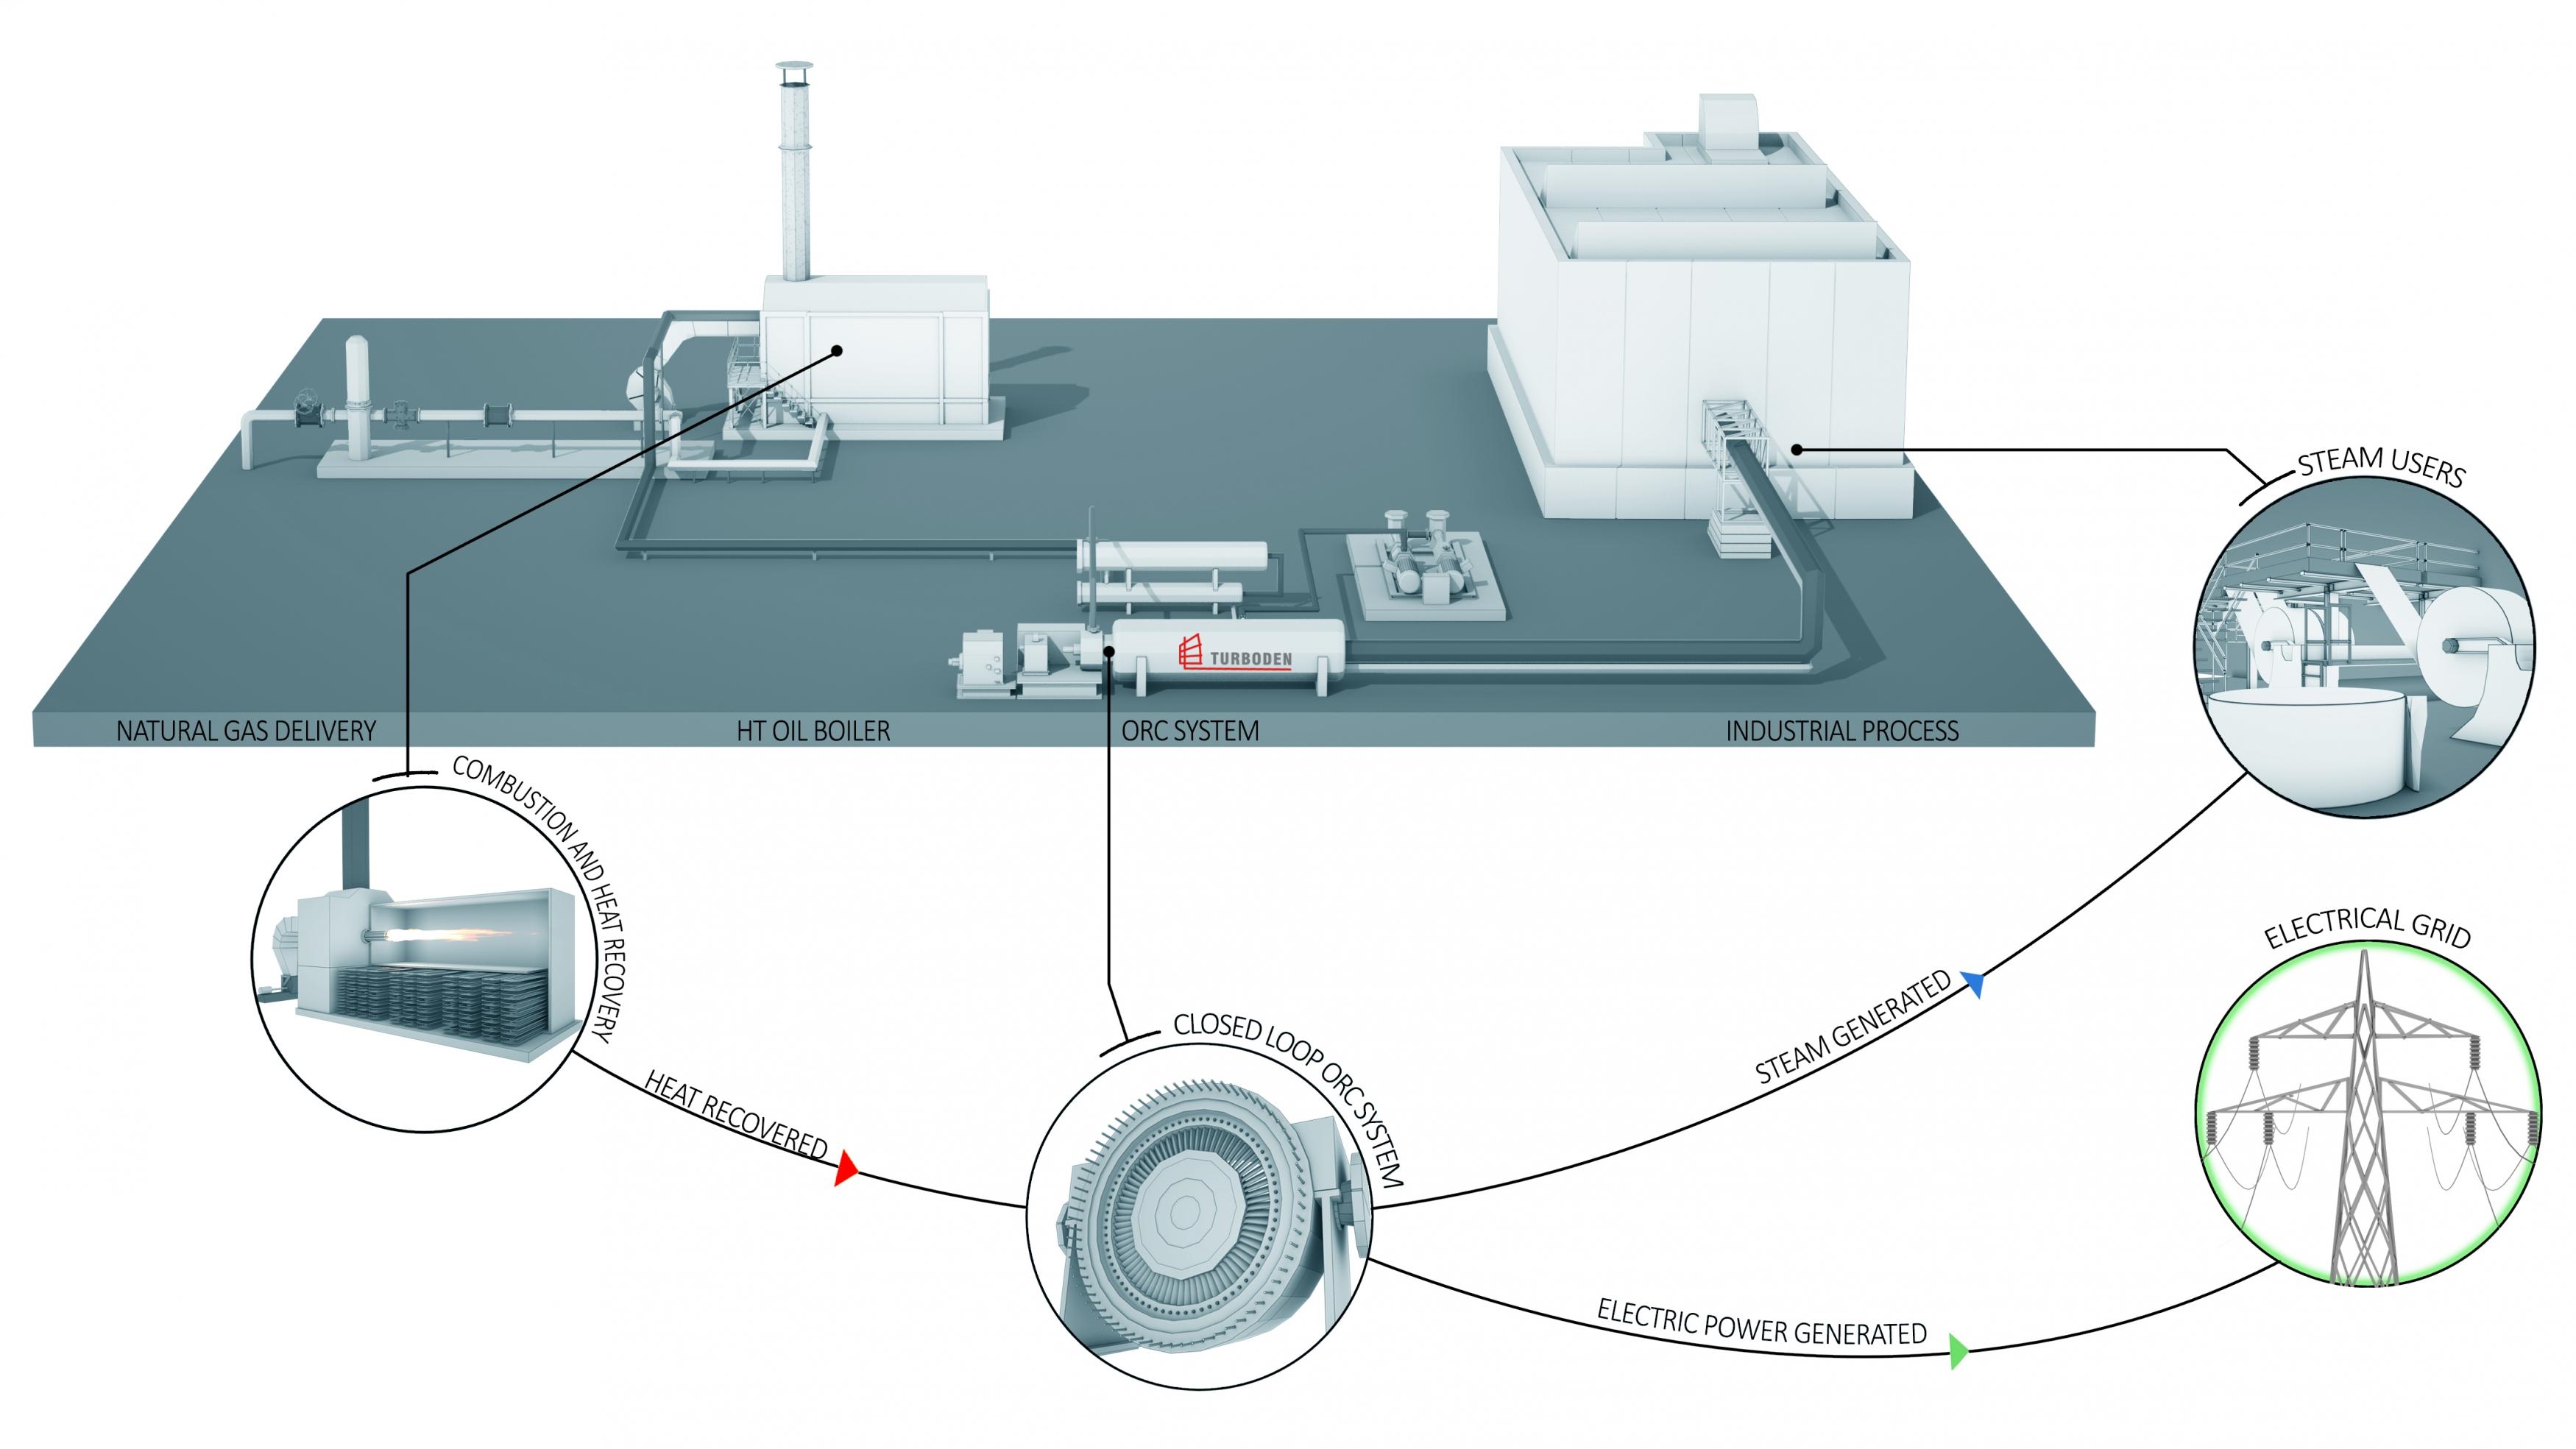 Steam & Power Sistemi